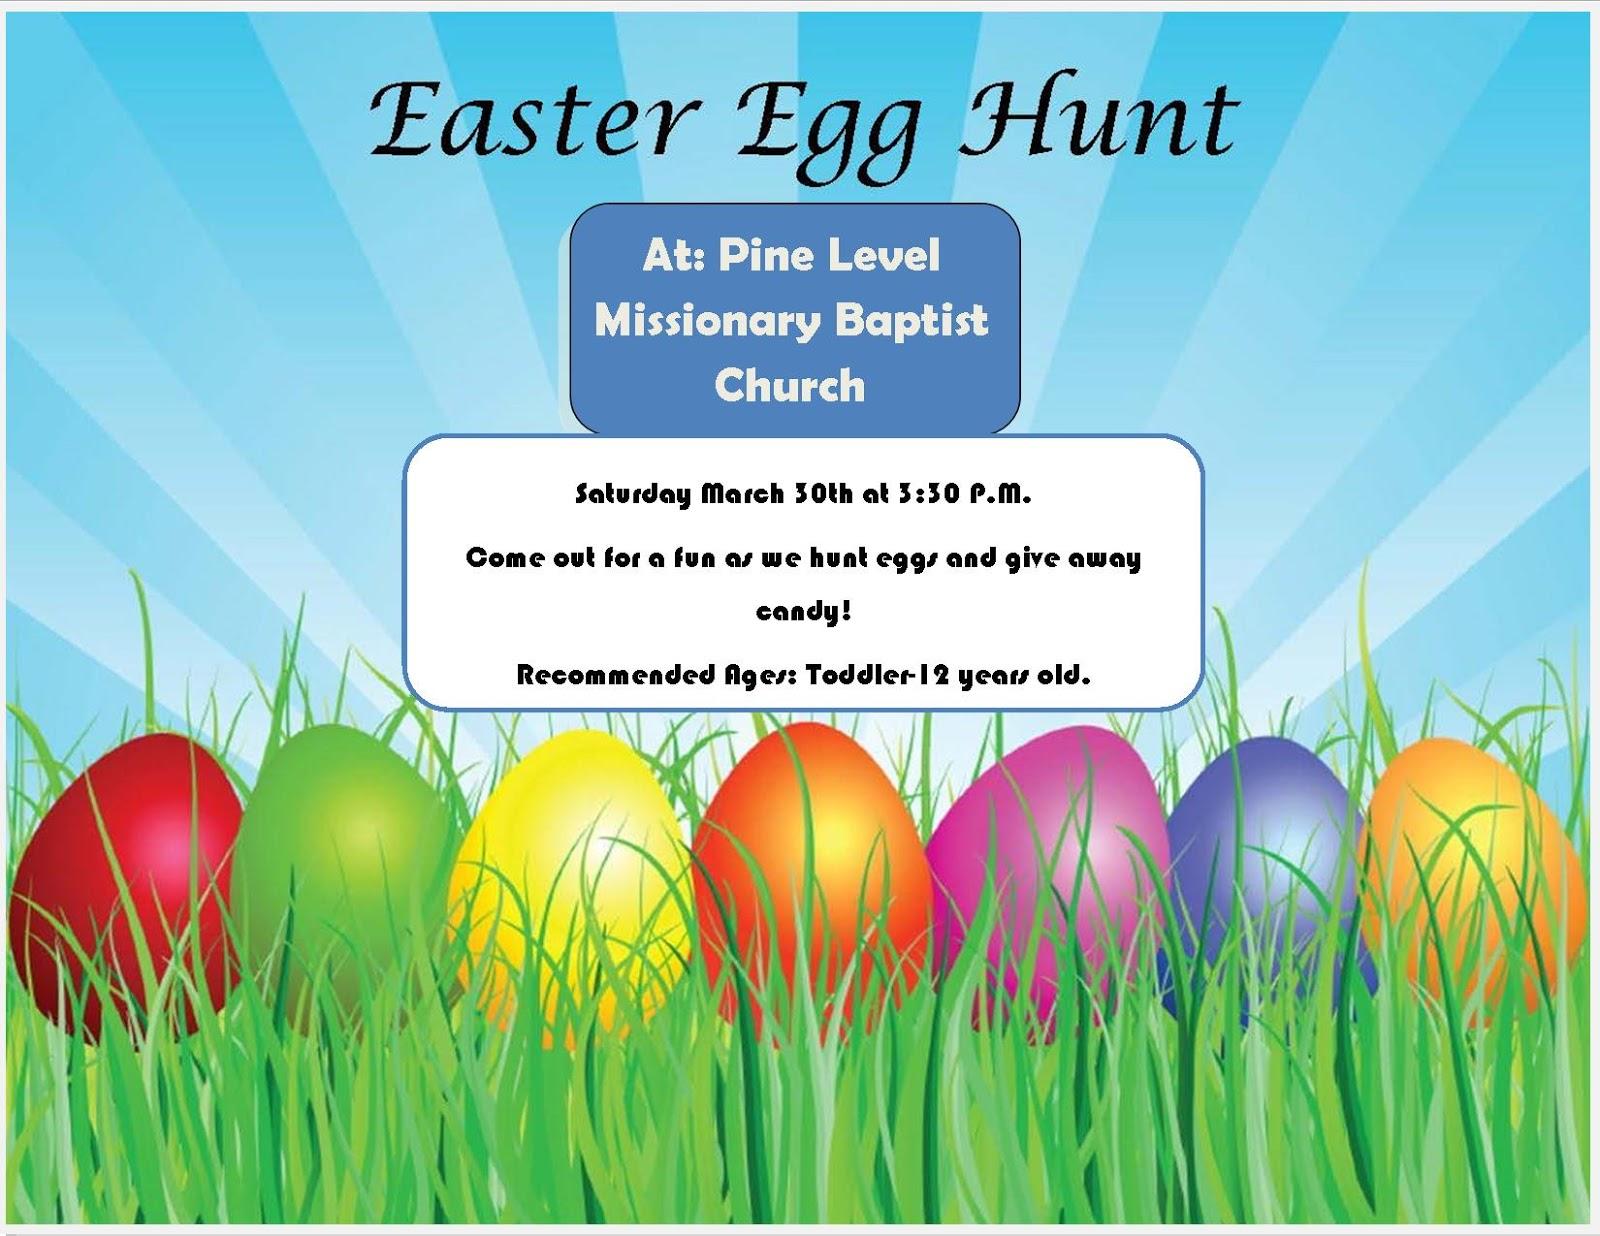 Easter Egg Hunt Flyers Community easter egg hunt